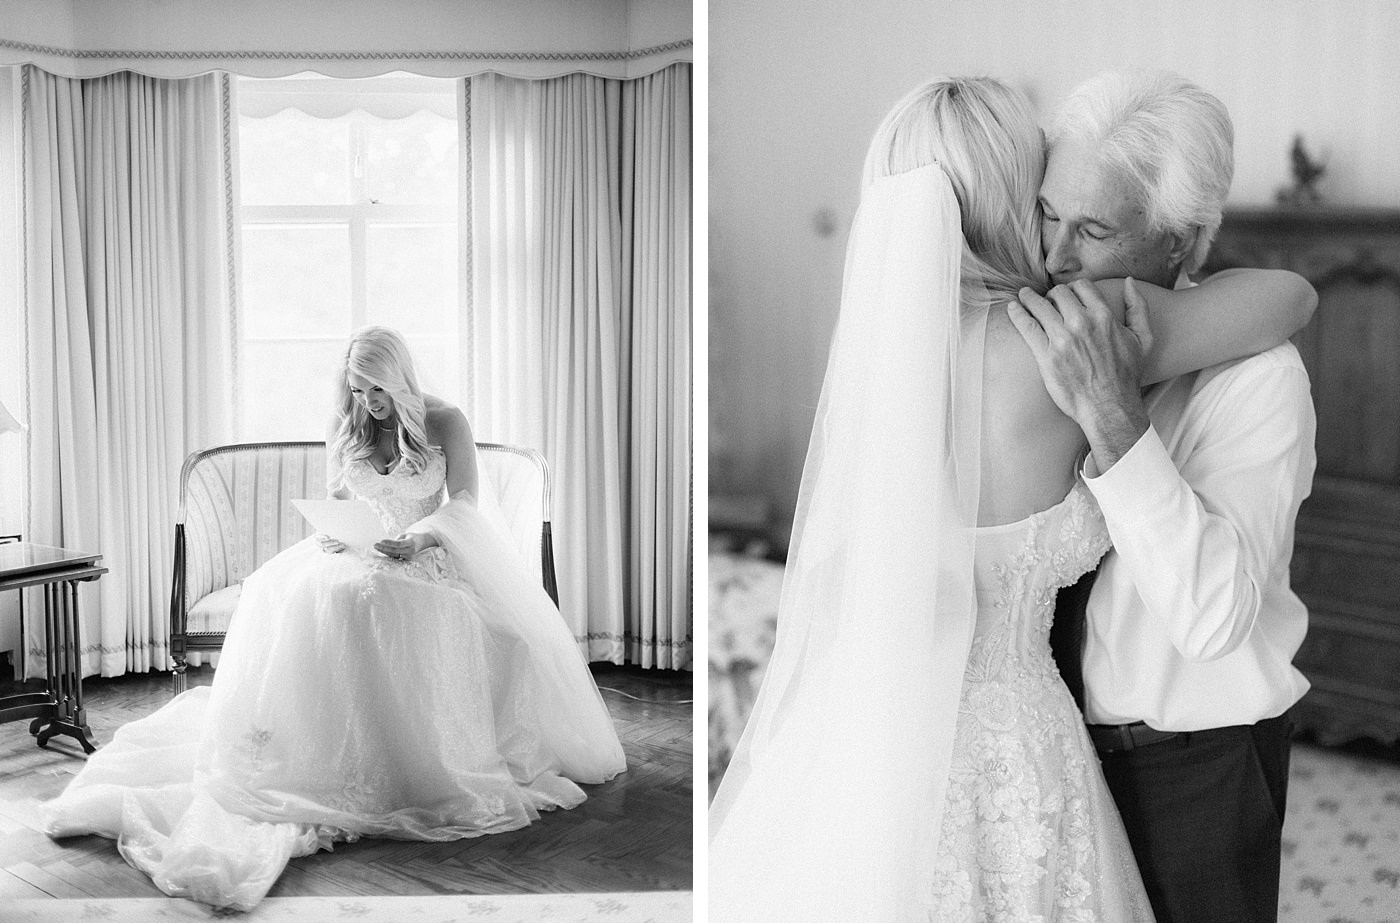 sentimental bride moment